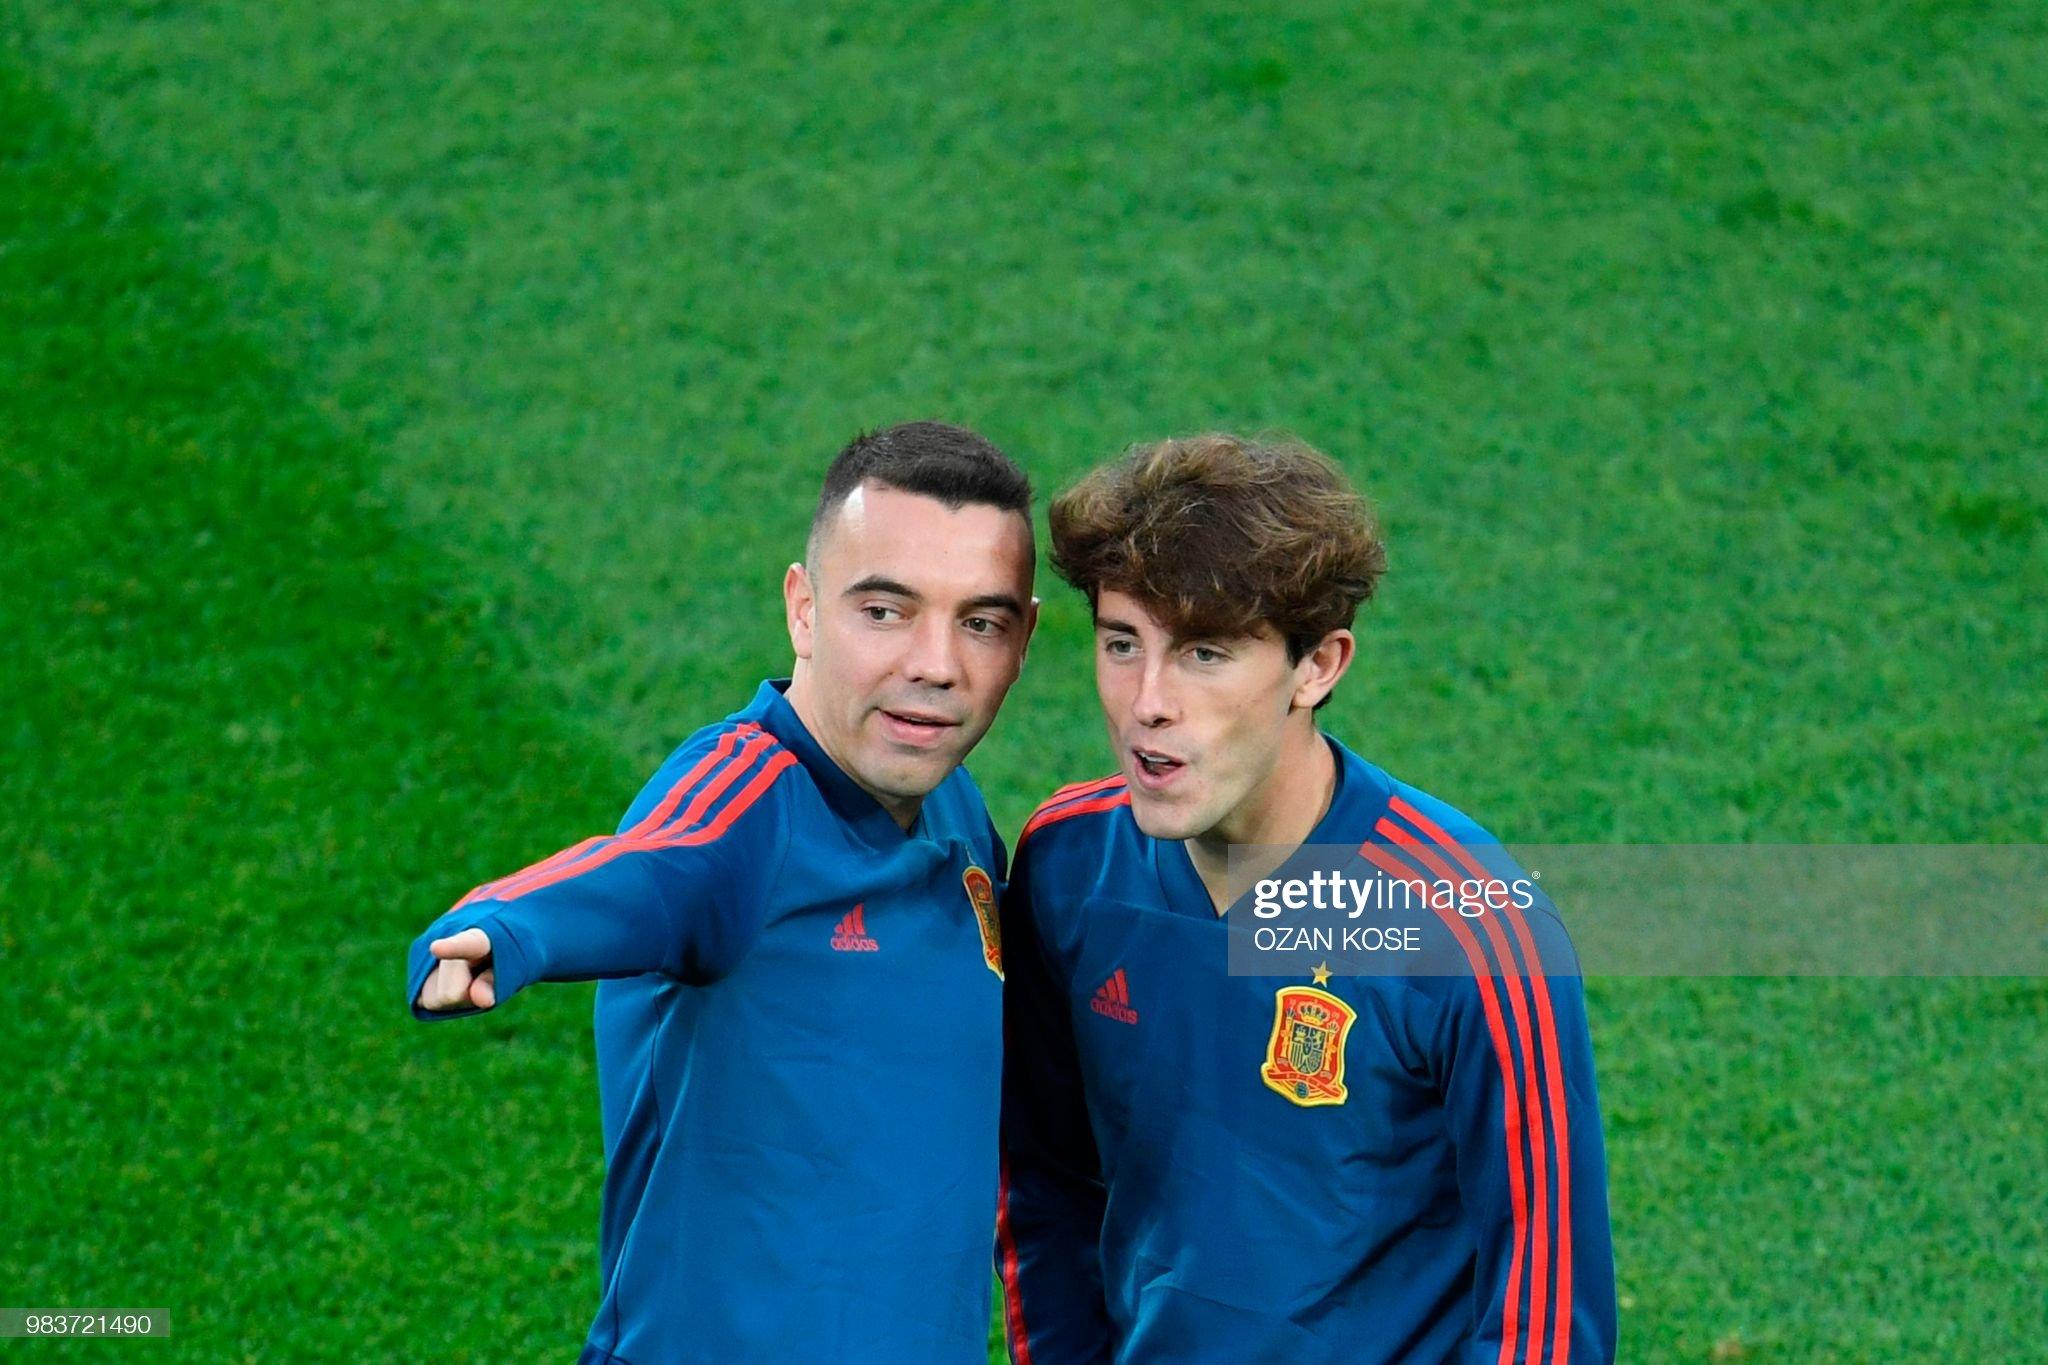 ¿Cuánto mide Álvaro Odriozola? - Altura - Página 5 Spains-forward-iago-aspas-chats-with-spains-defender-alvaro-odriozola-picture-id983721490?s=2048x2048